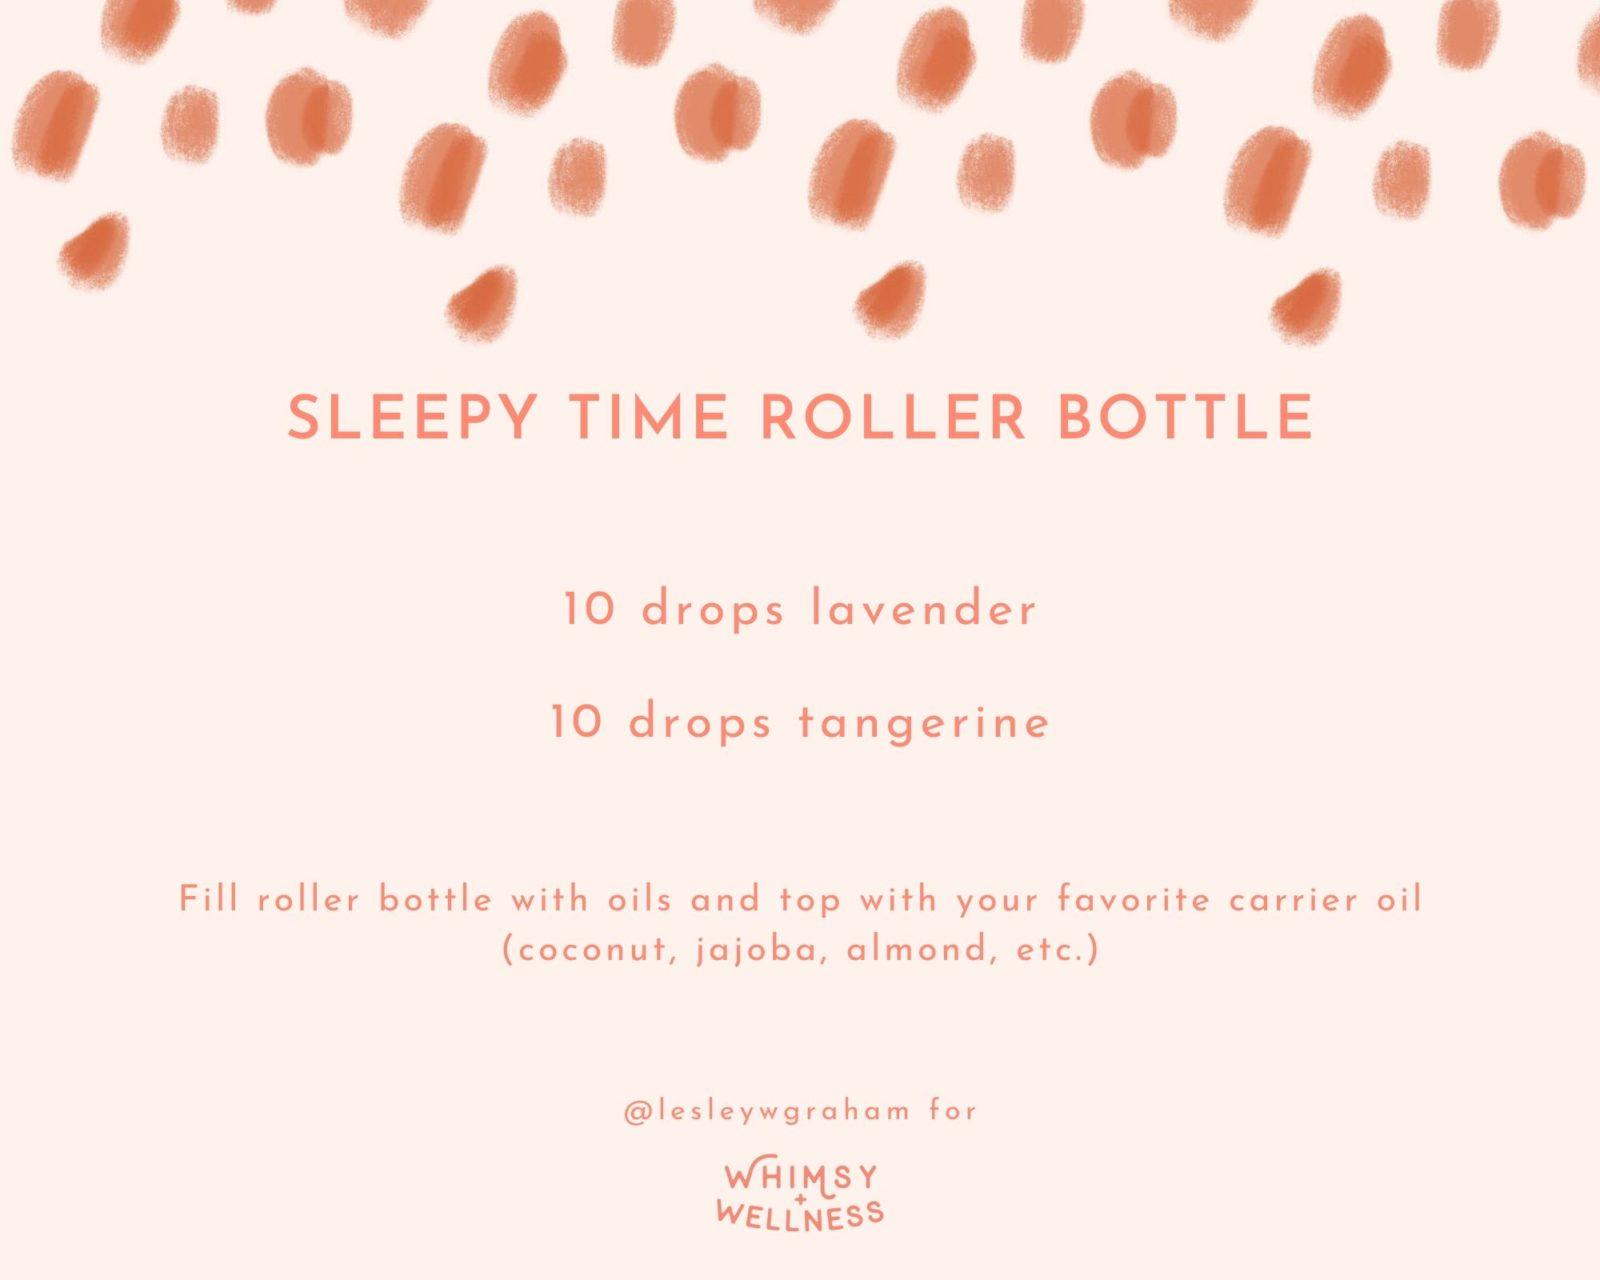 Sleepy Time Roller Bottle Blend Lesley W Graham Young Living Crown Diamond Whimsy + Wellness